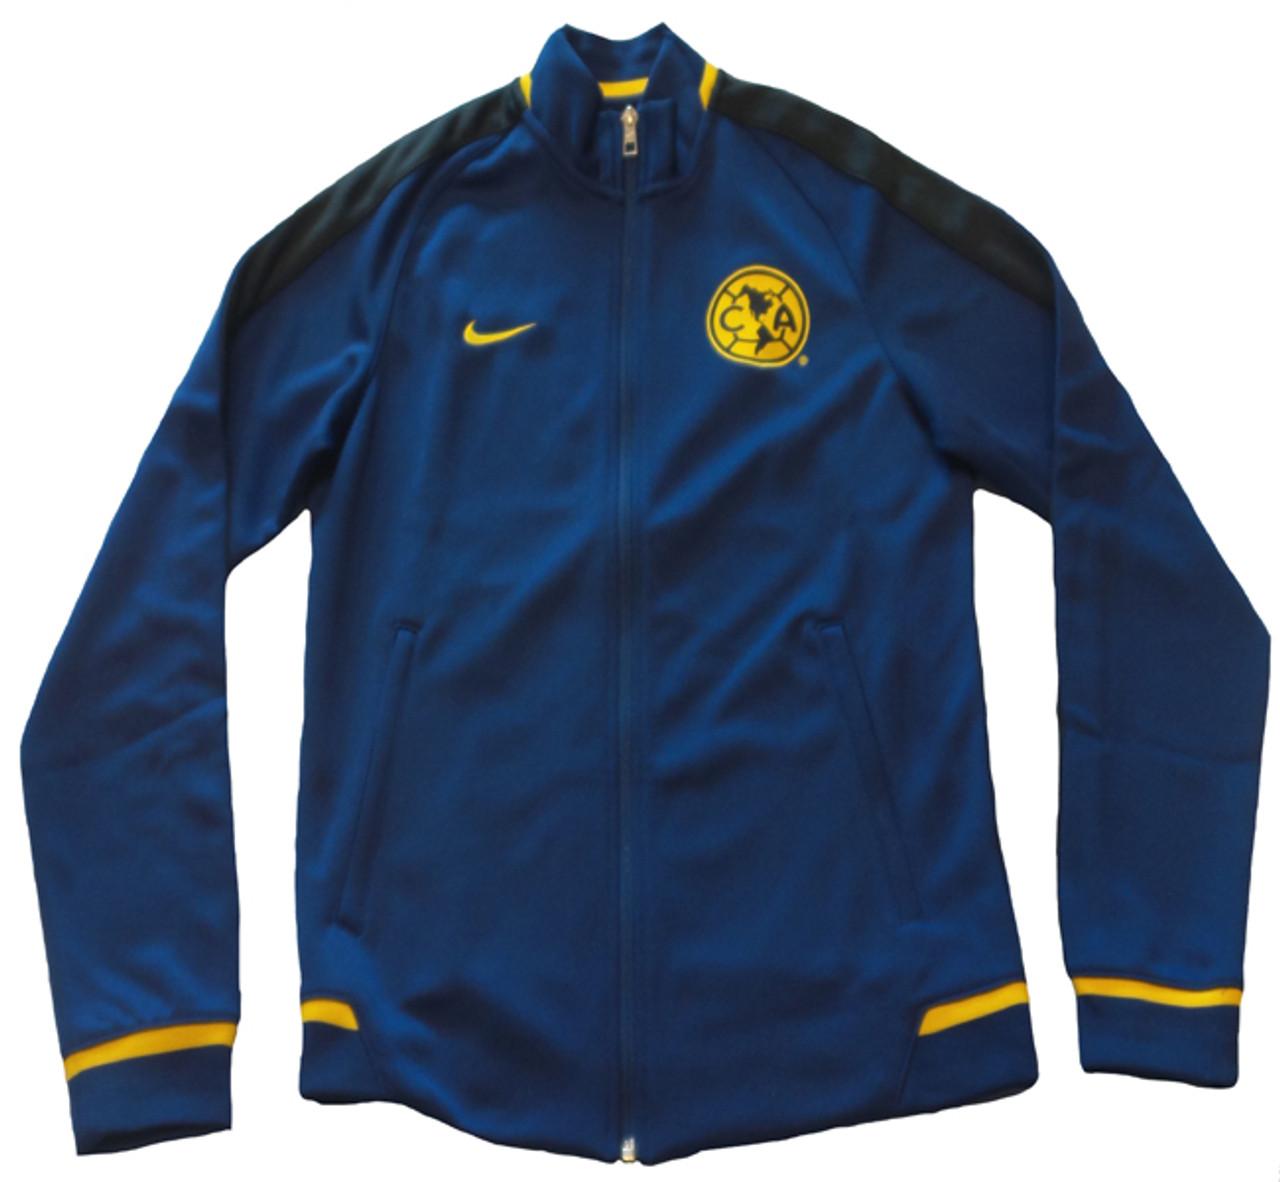 89cf5ab4e NIKE CLUBE AMERICA 2016 BLUE AUTHENTIC N98 JACKET - Soccer Plus